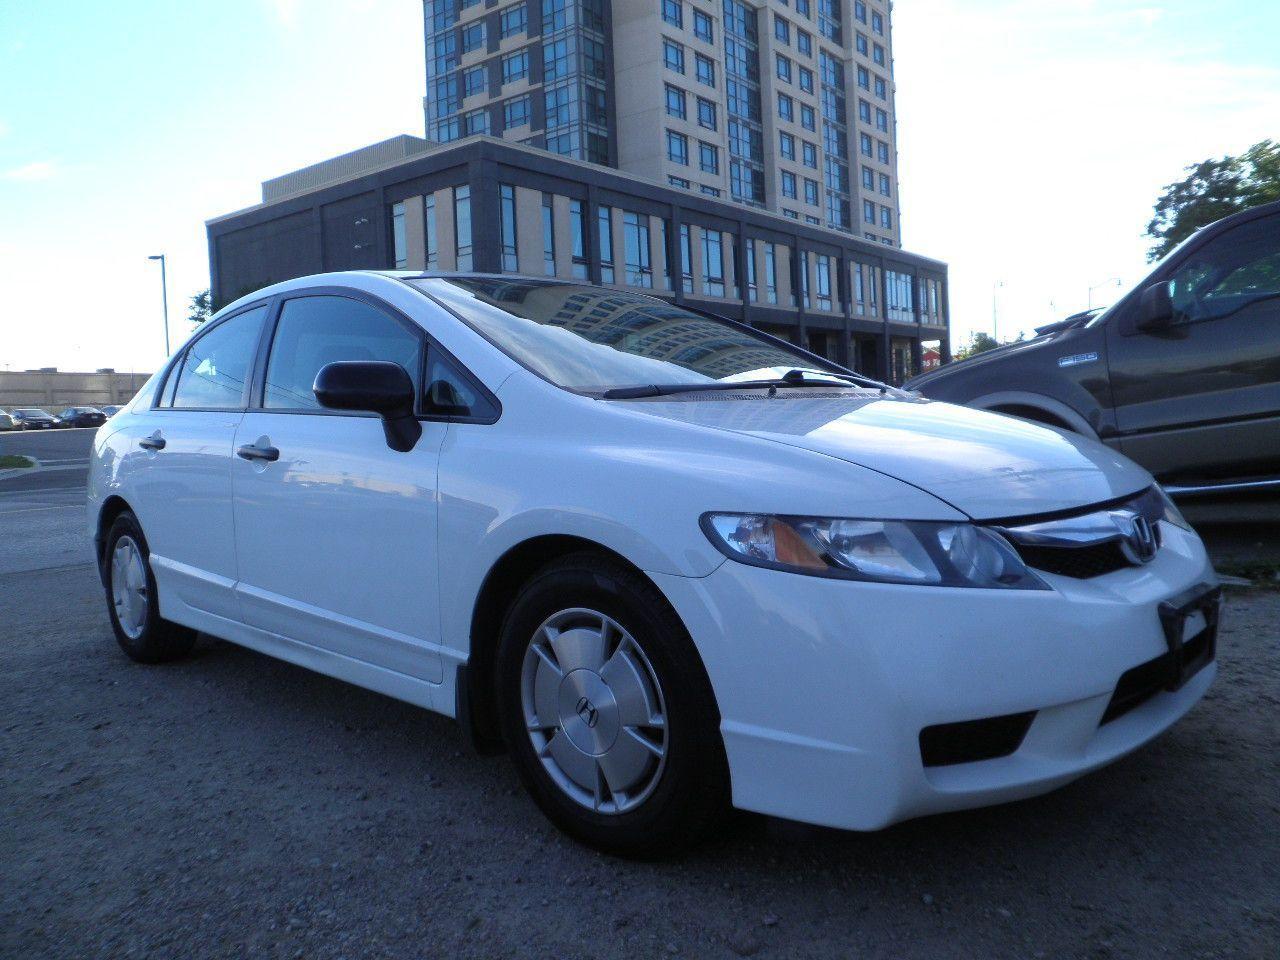 Photo of White 2011 Honda Civic